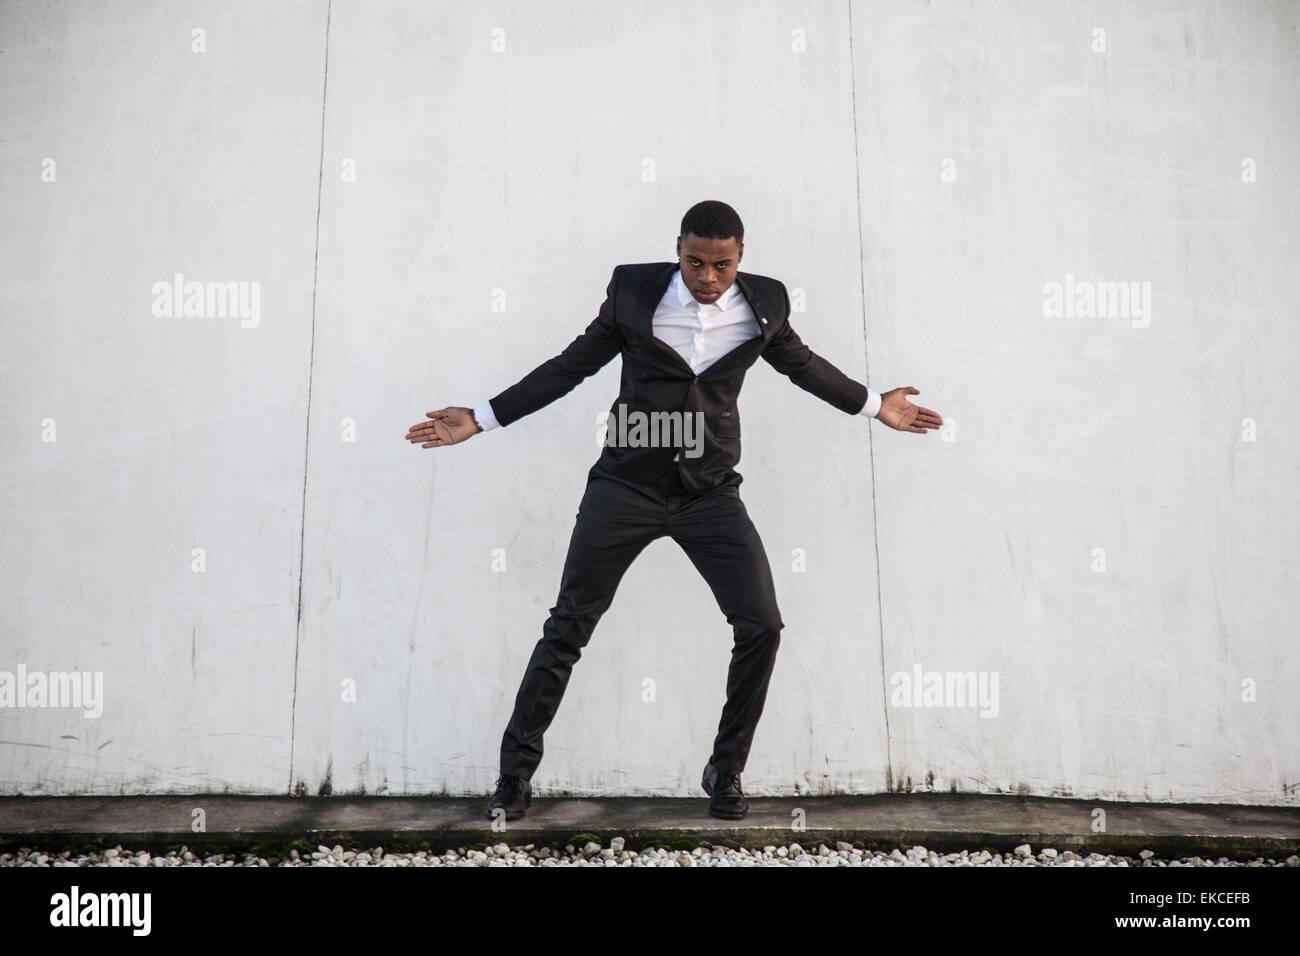 Jeune homme en costume de danse de rue Photo Stock